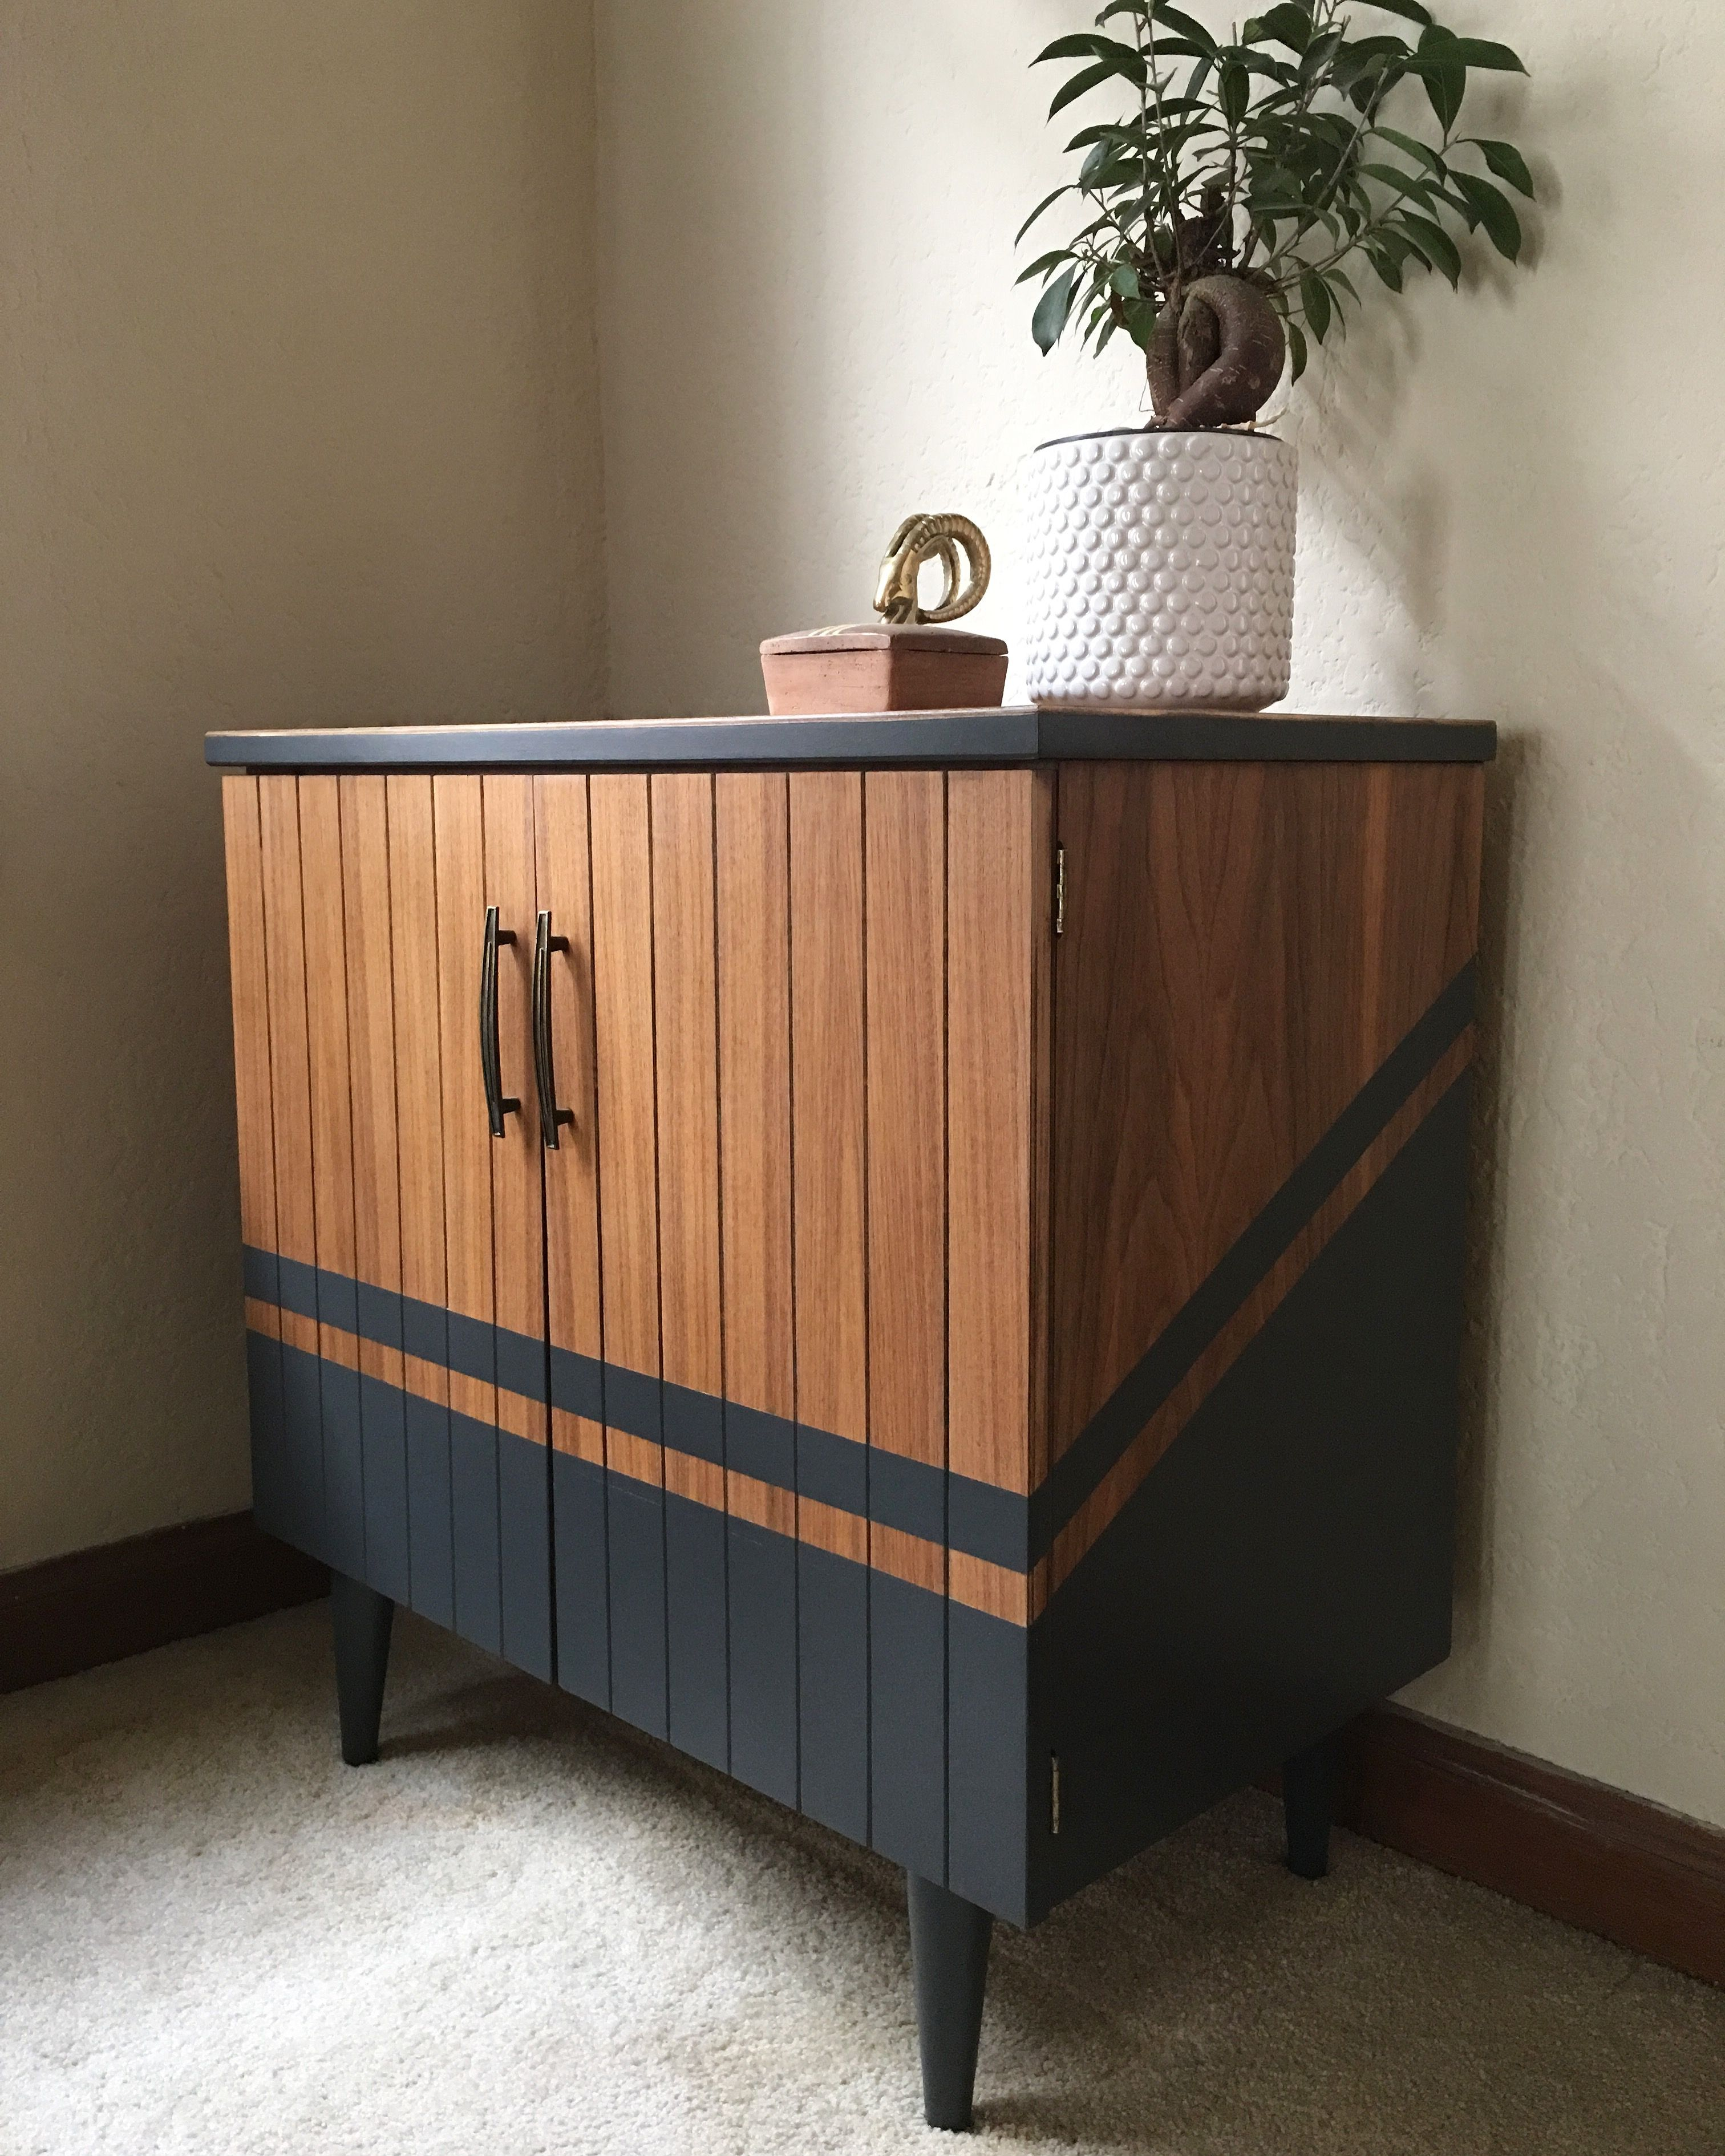 Mid Century Teak Cabinet Furniture Renovation Furniture Restoration Furniture Design Modern